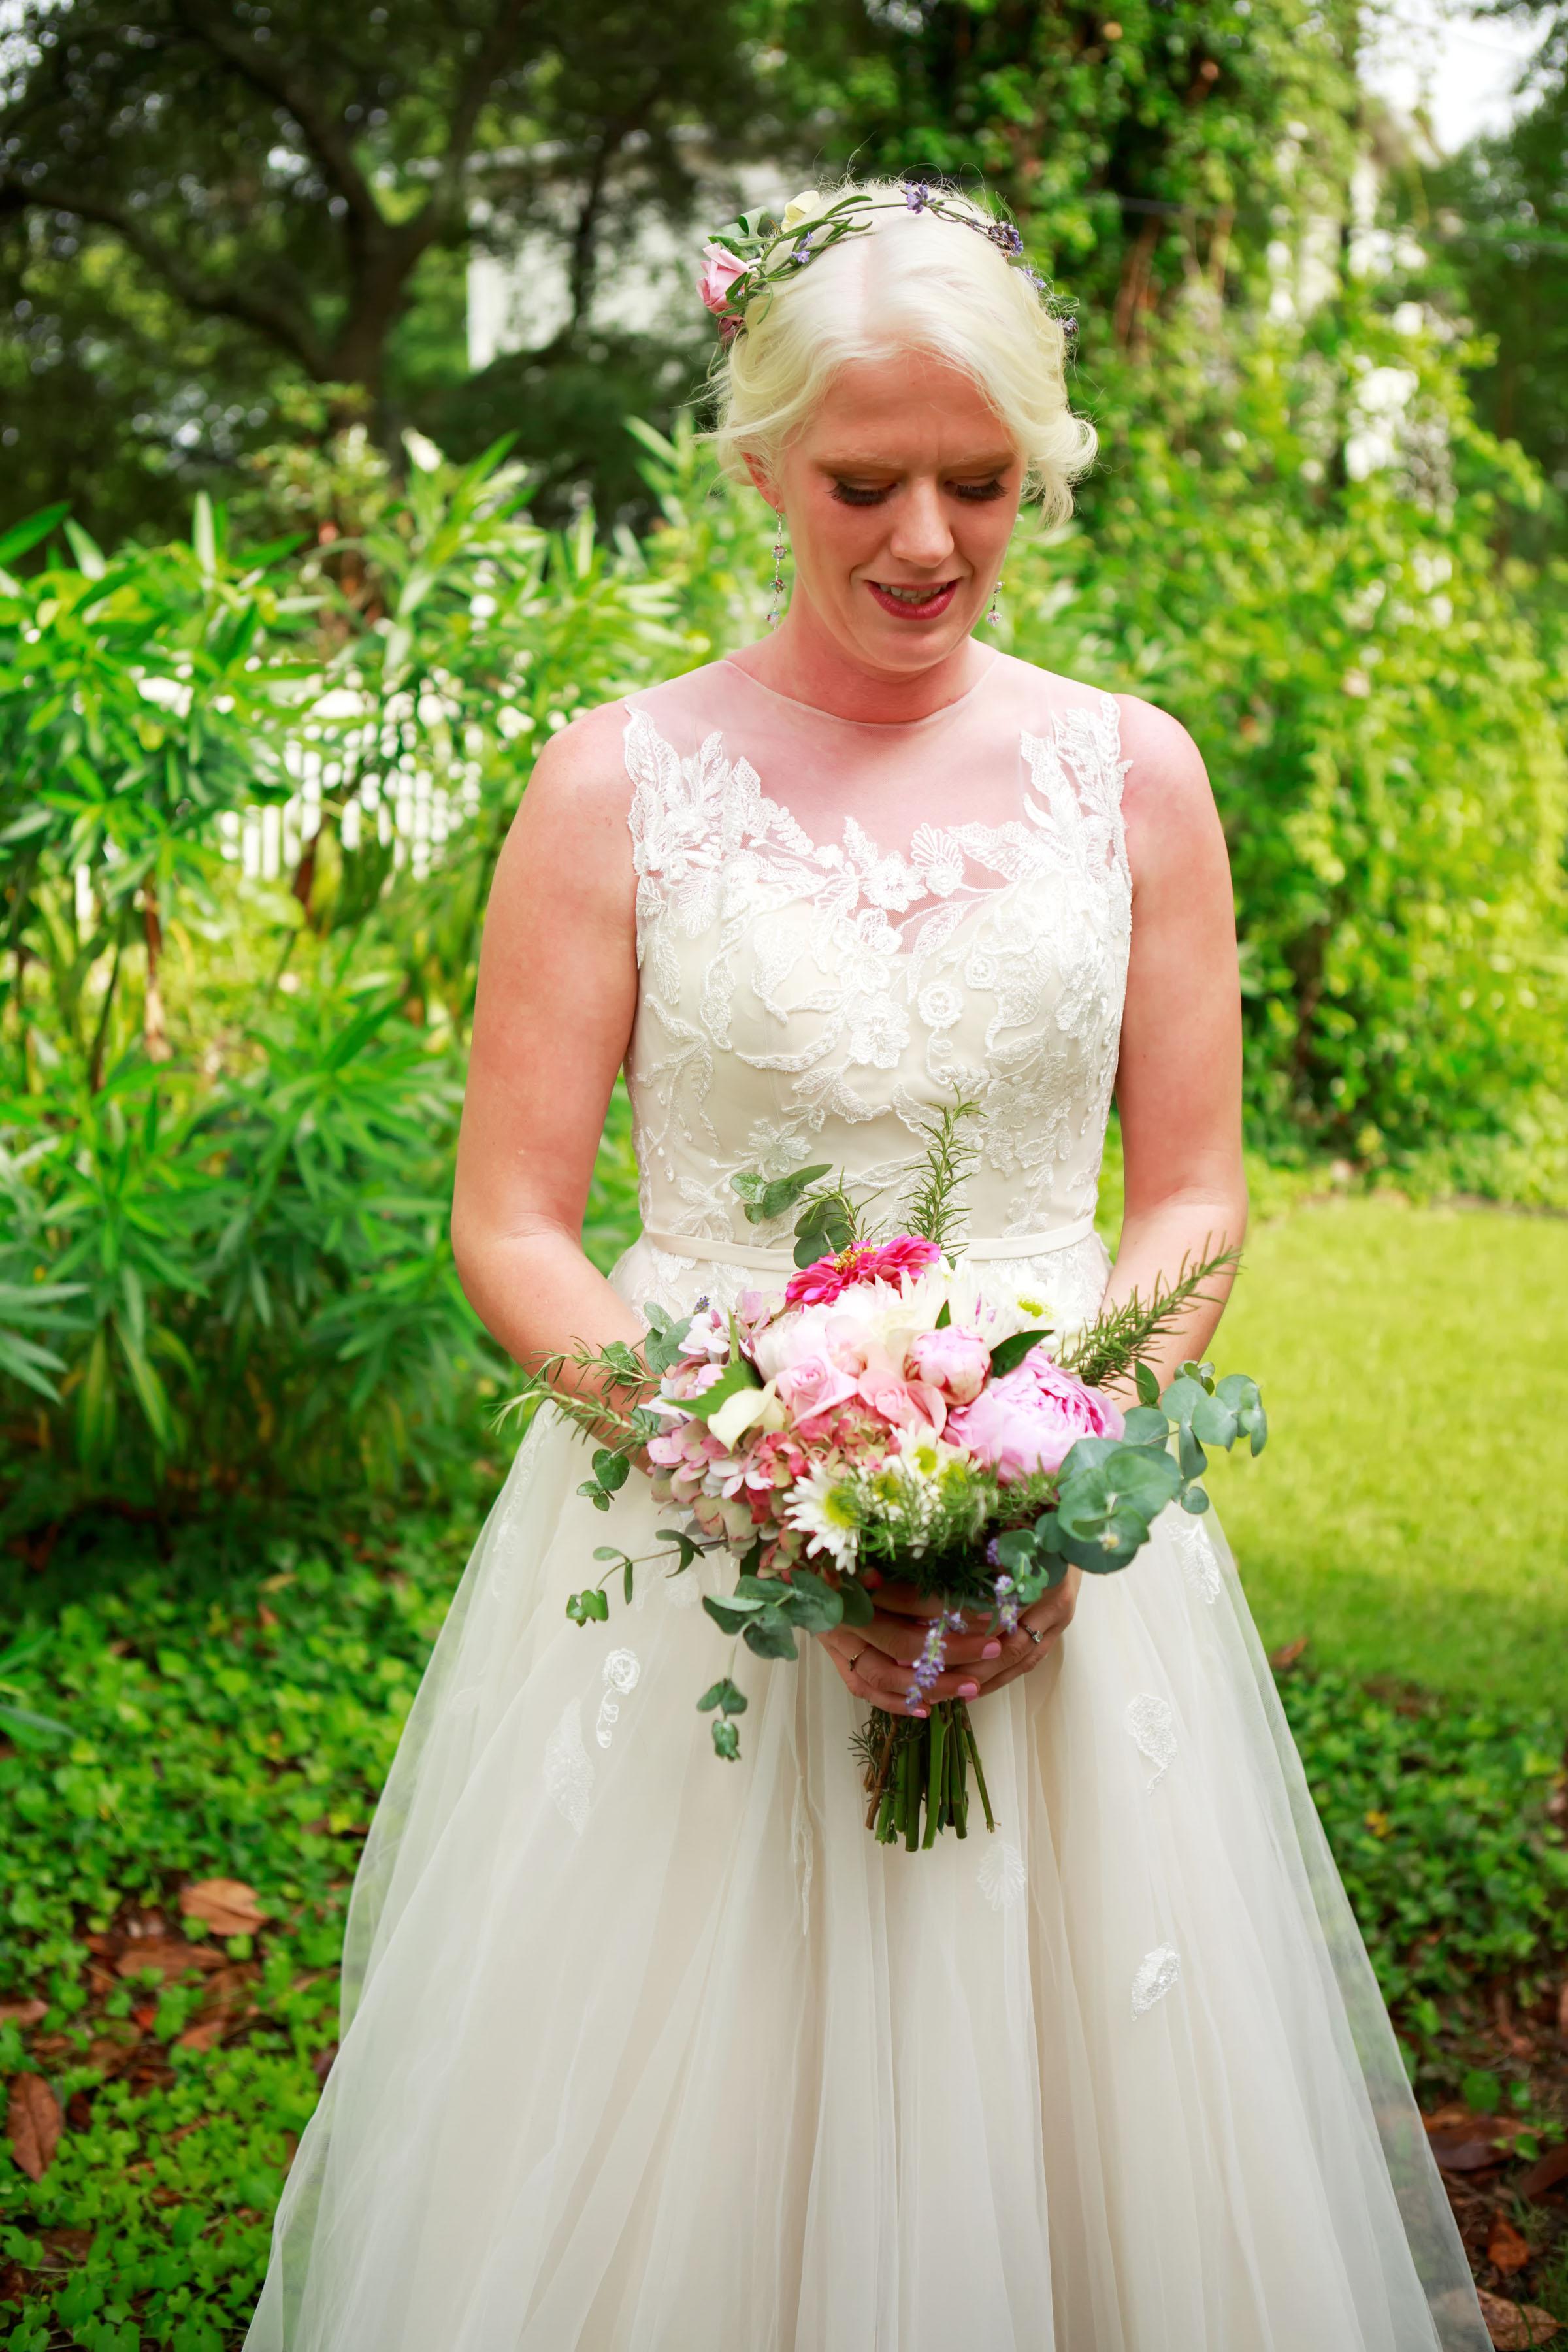 128-South-Wedding-Tiffany-Abruzzo-Photography-Bride-&-Groom-12.jpg